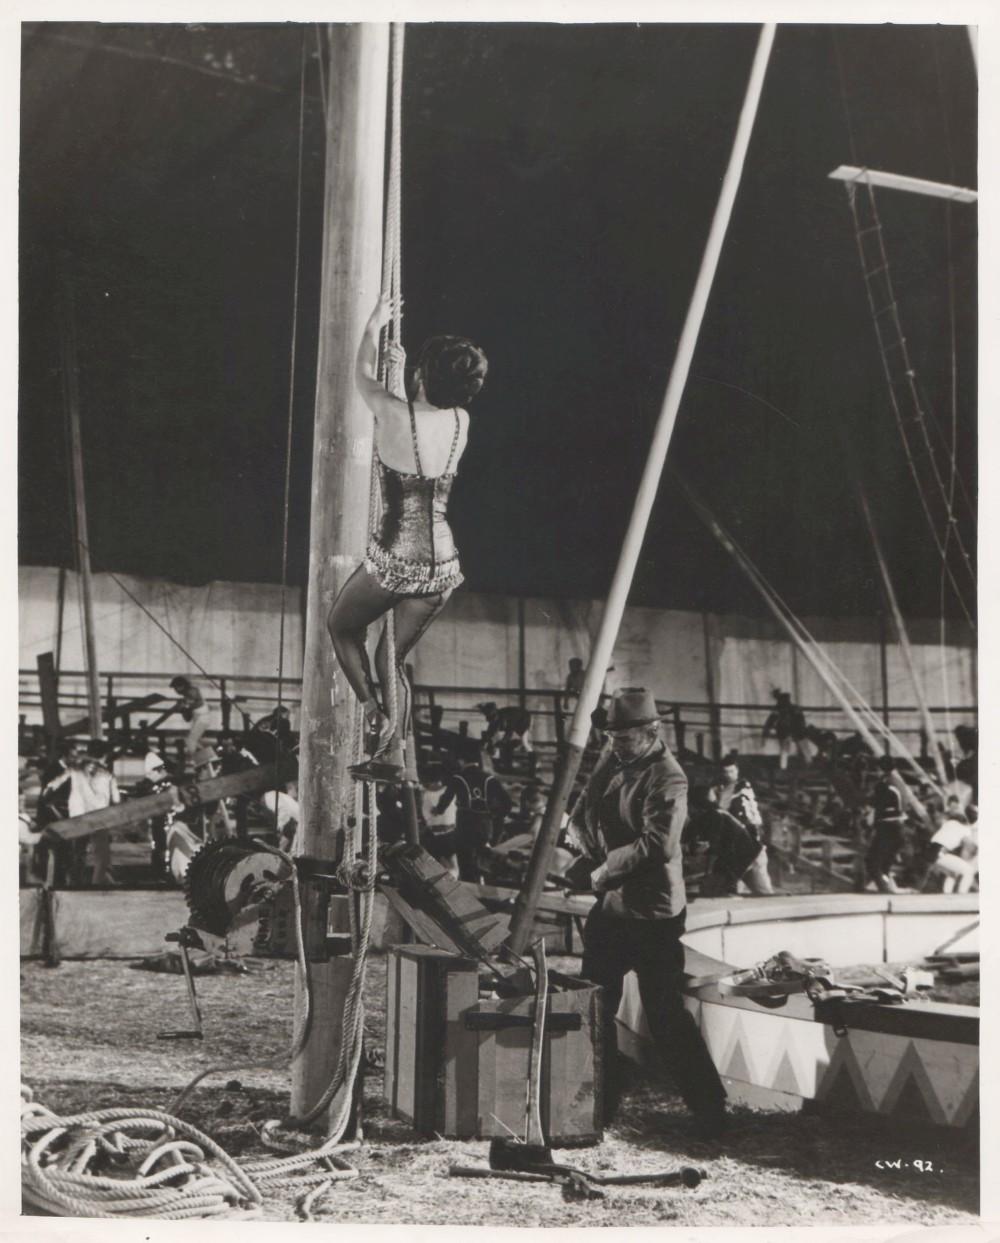 Le Plus Grand Cirque du Monde - Circus World - 1964  - Page 3 Wayne757